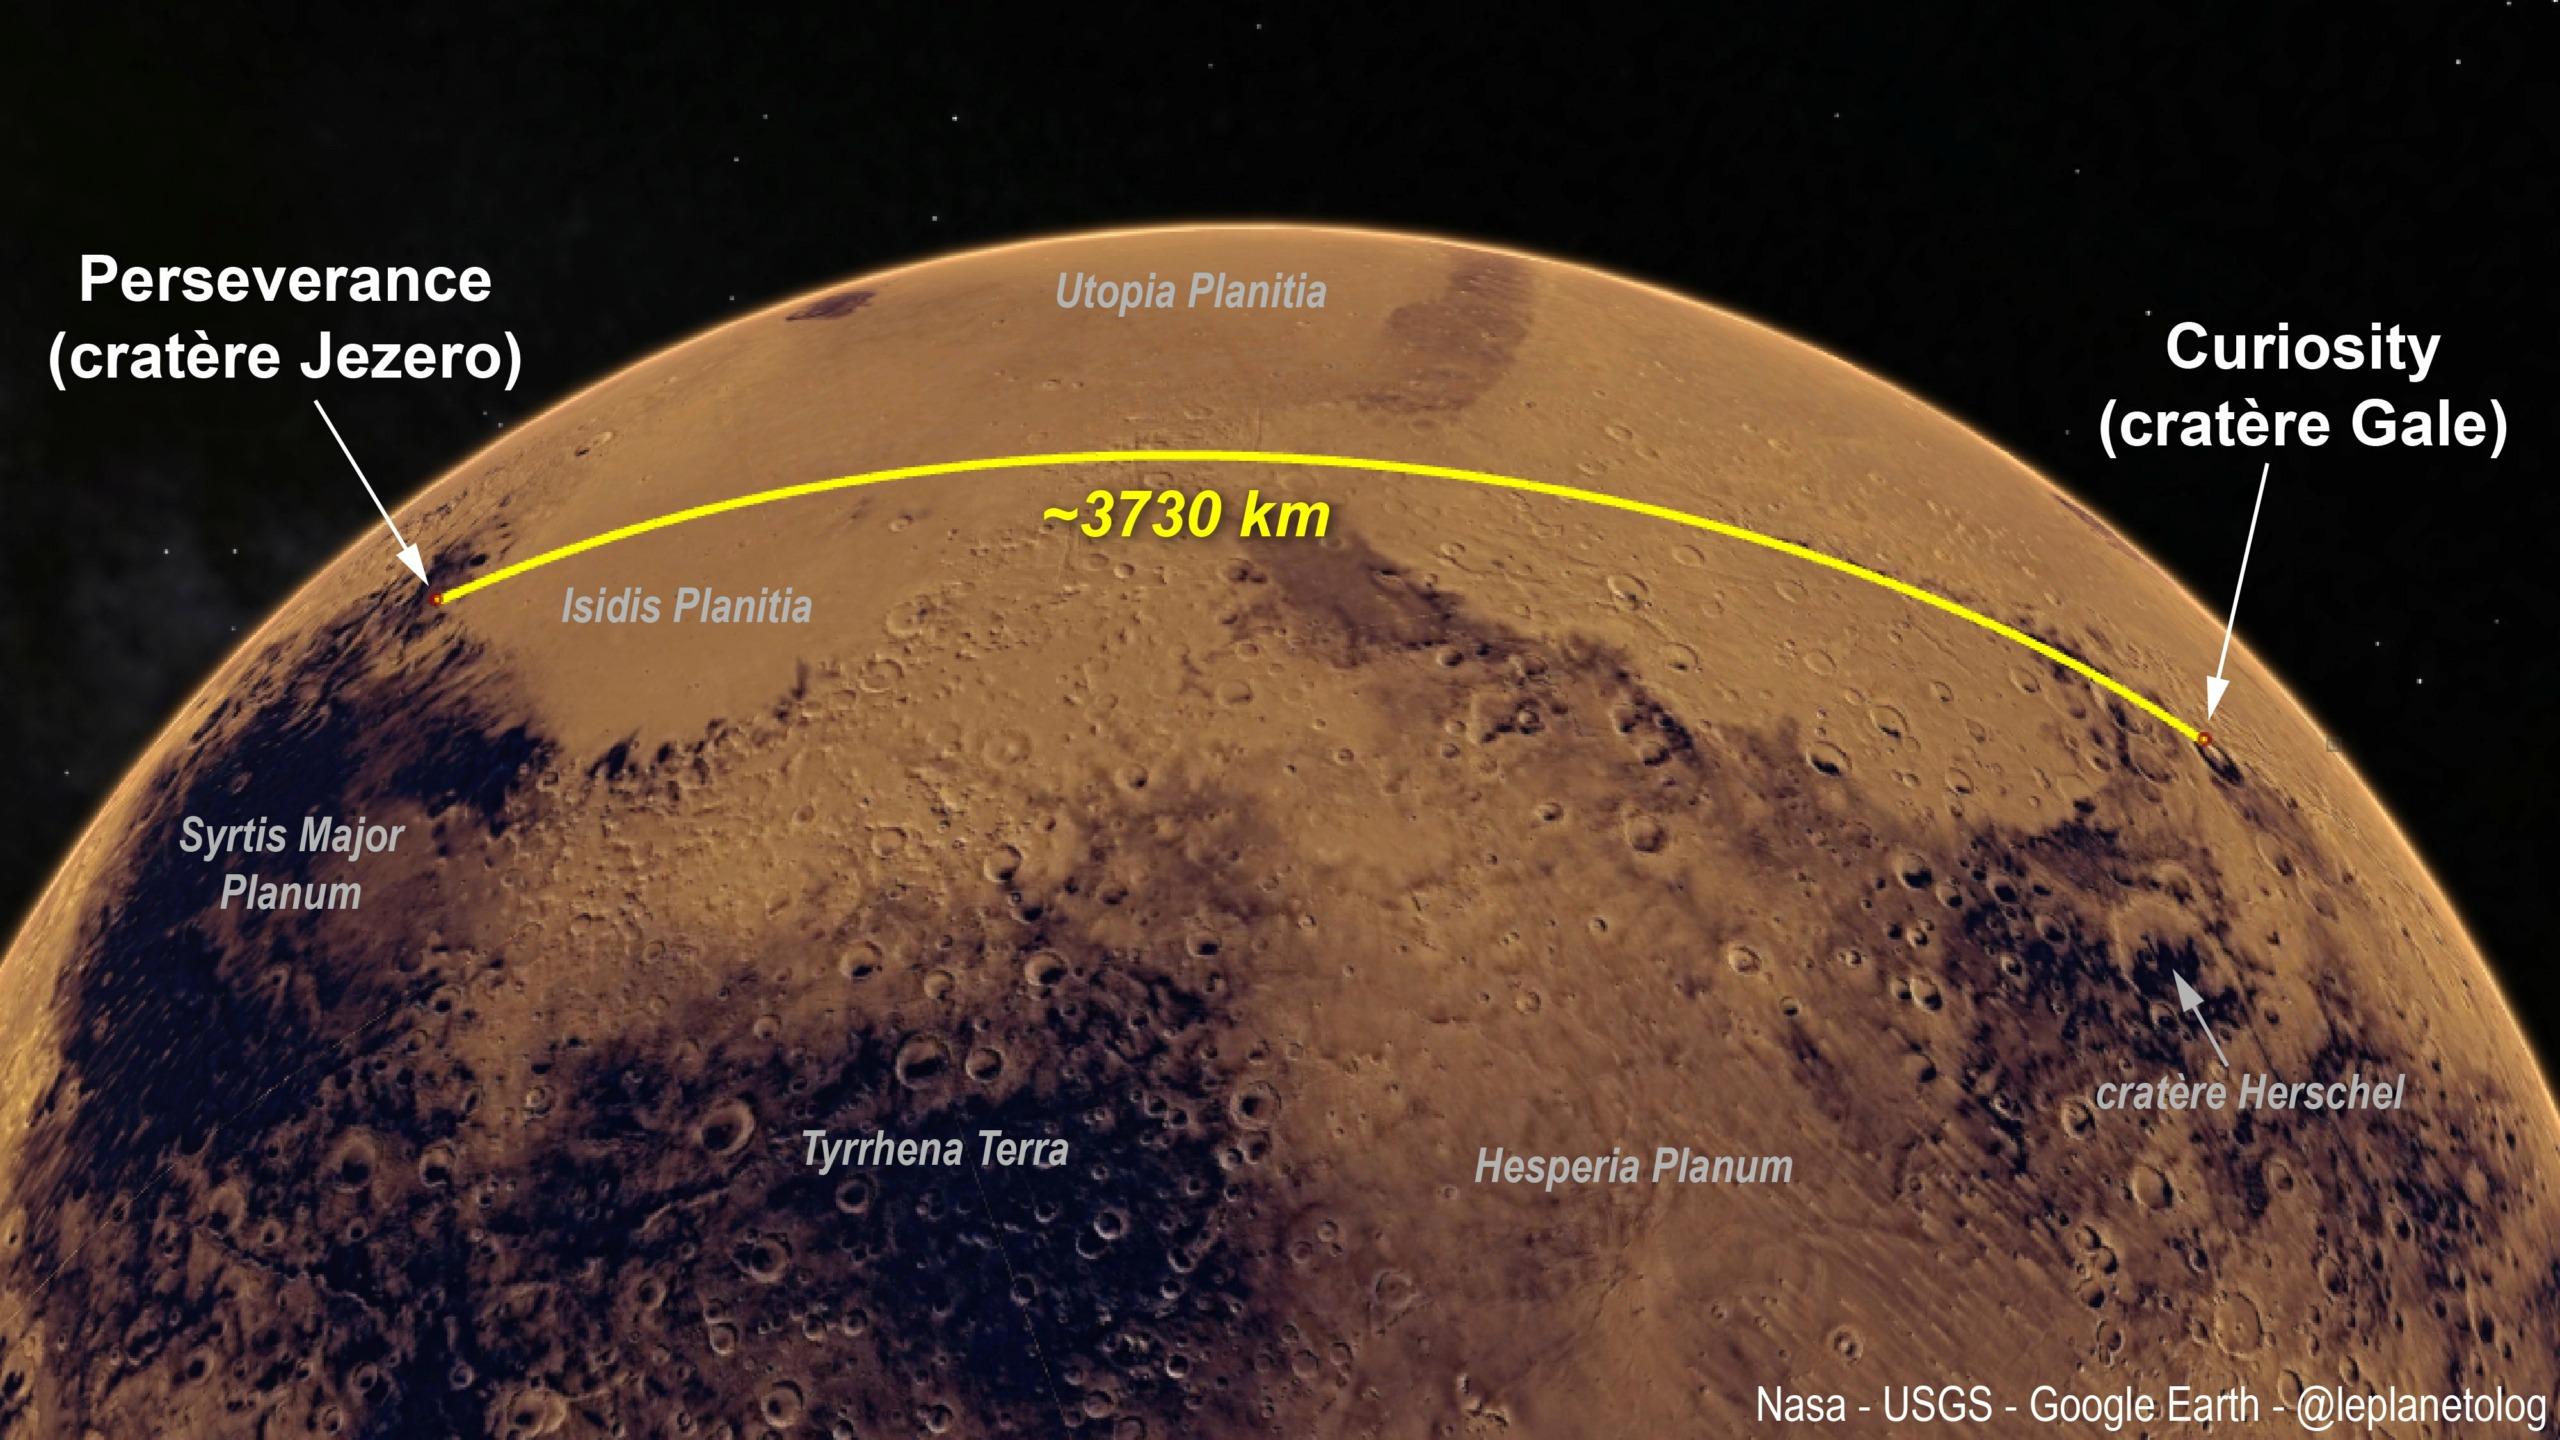 Mars 2020 (Perseverance - Ingenuity) : exploration du cratère Jezero - Page 2 11803